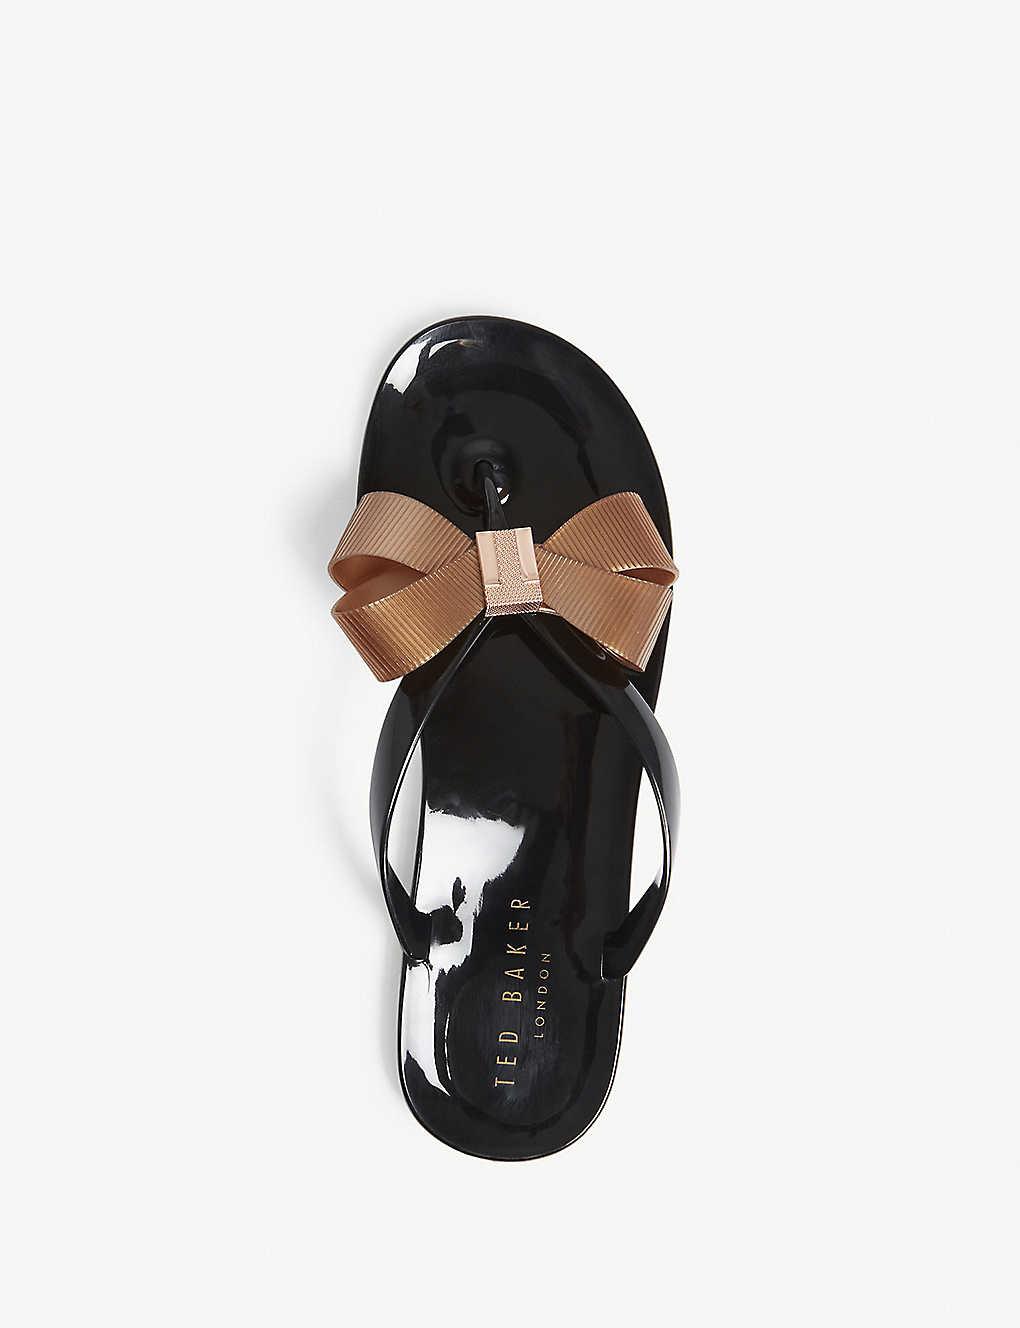 5cca6457b082 ... Suszie bow detail jelly sandals - Black ...